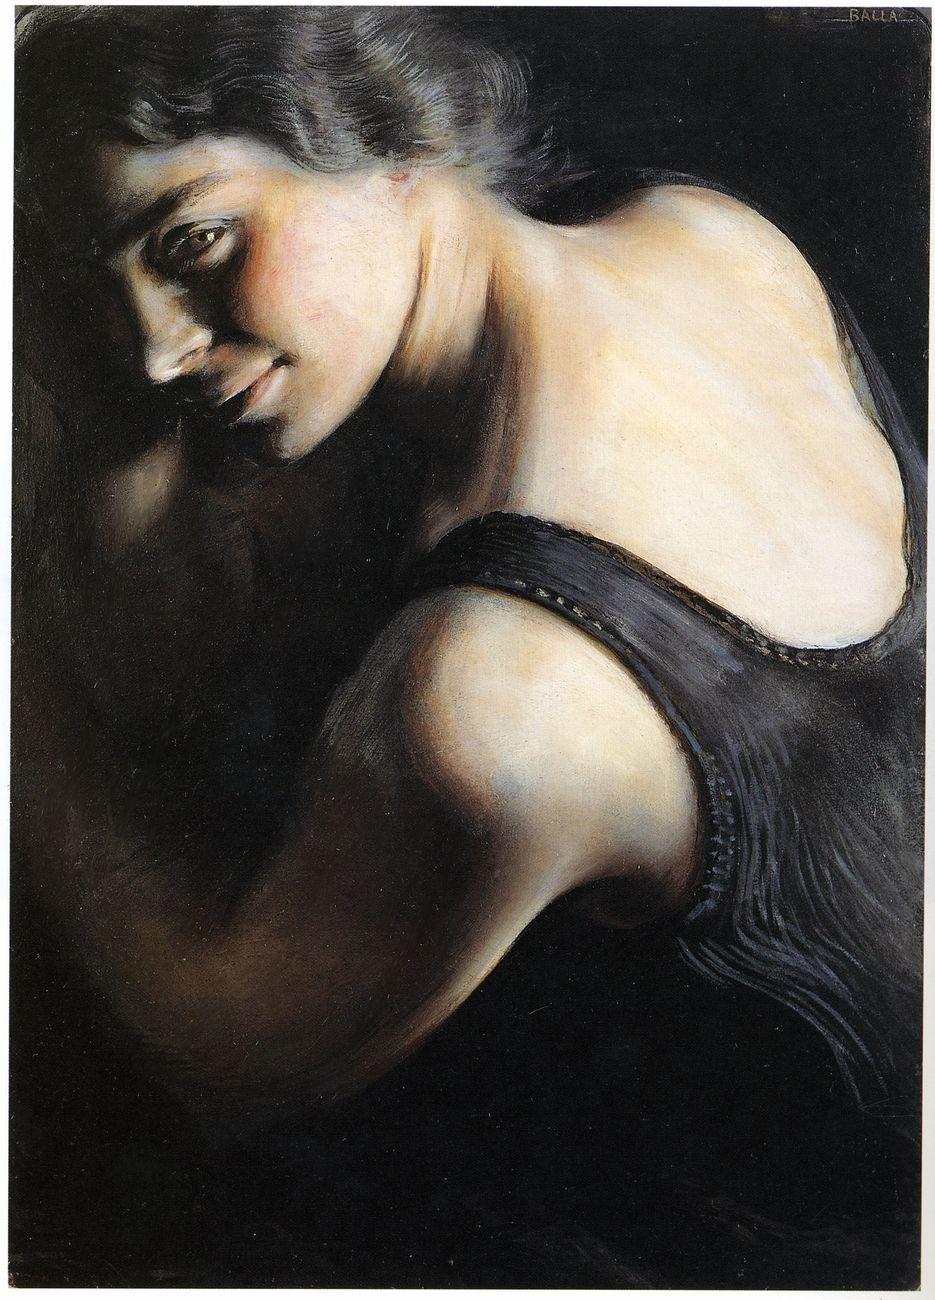 Giacomo Balla, Il dubbio, 1907-1908. Roma, Galleria d'Arte Moderna